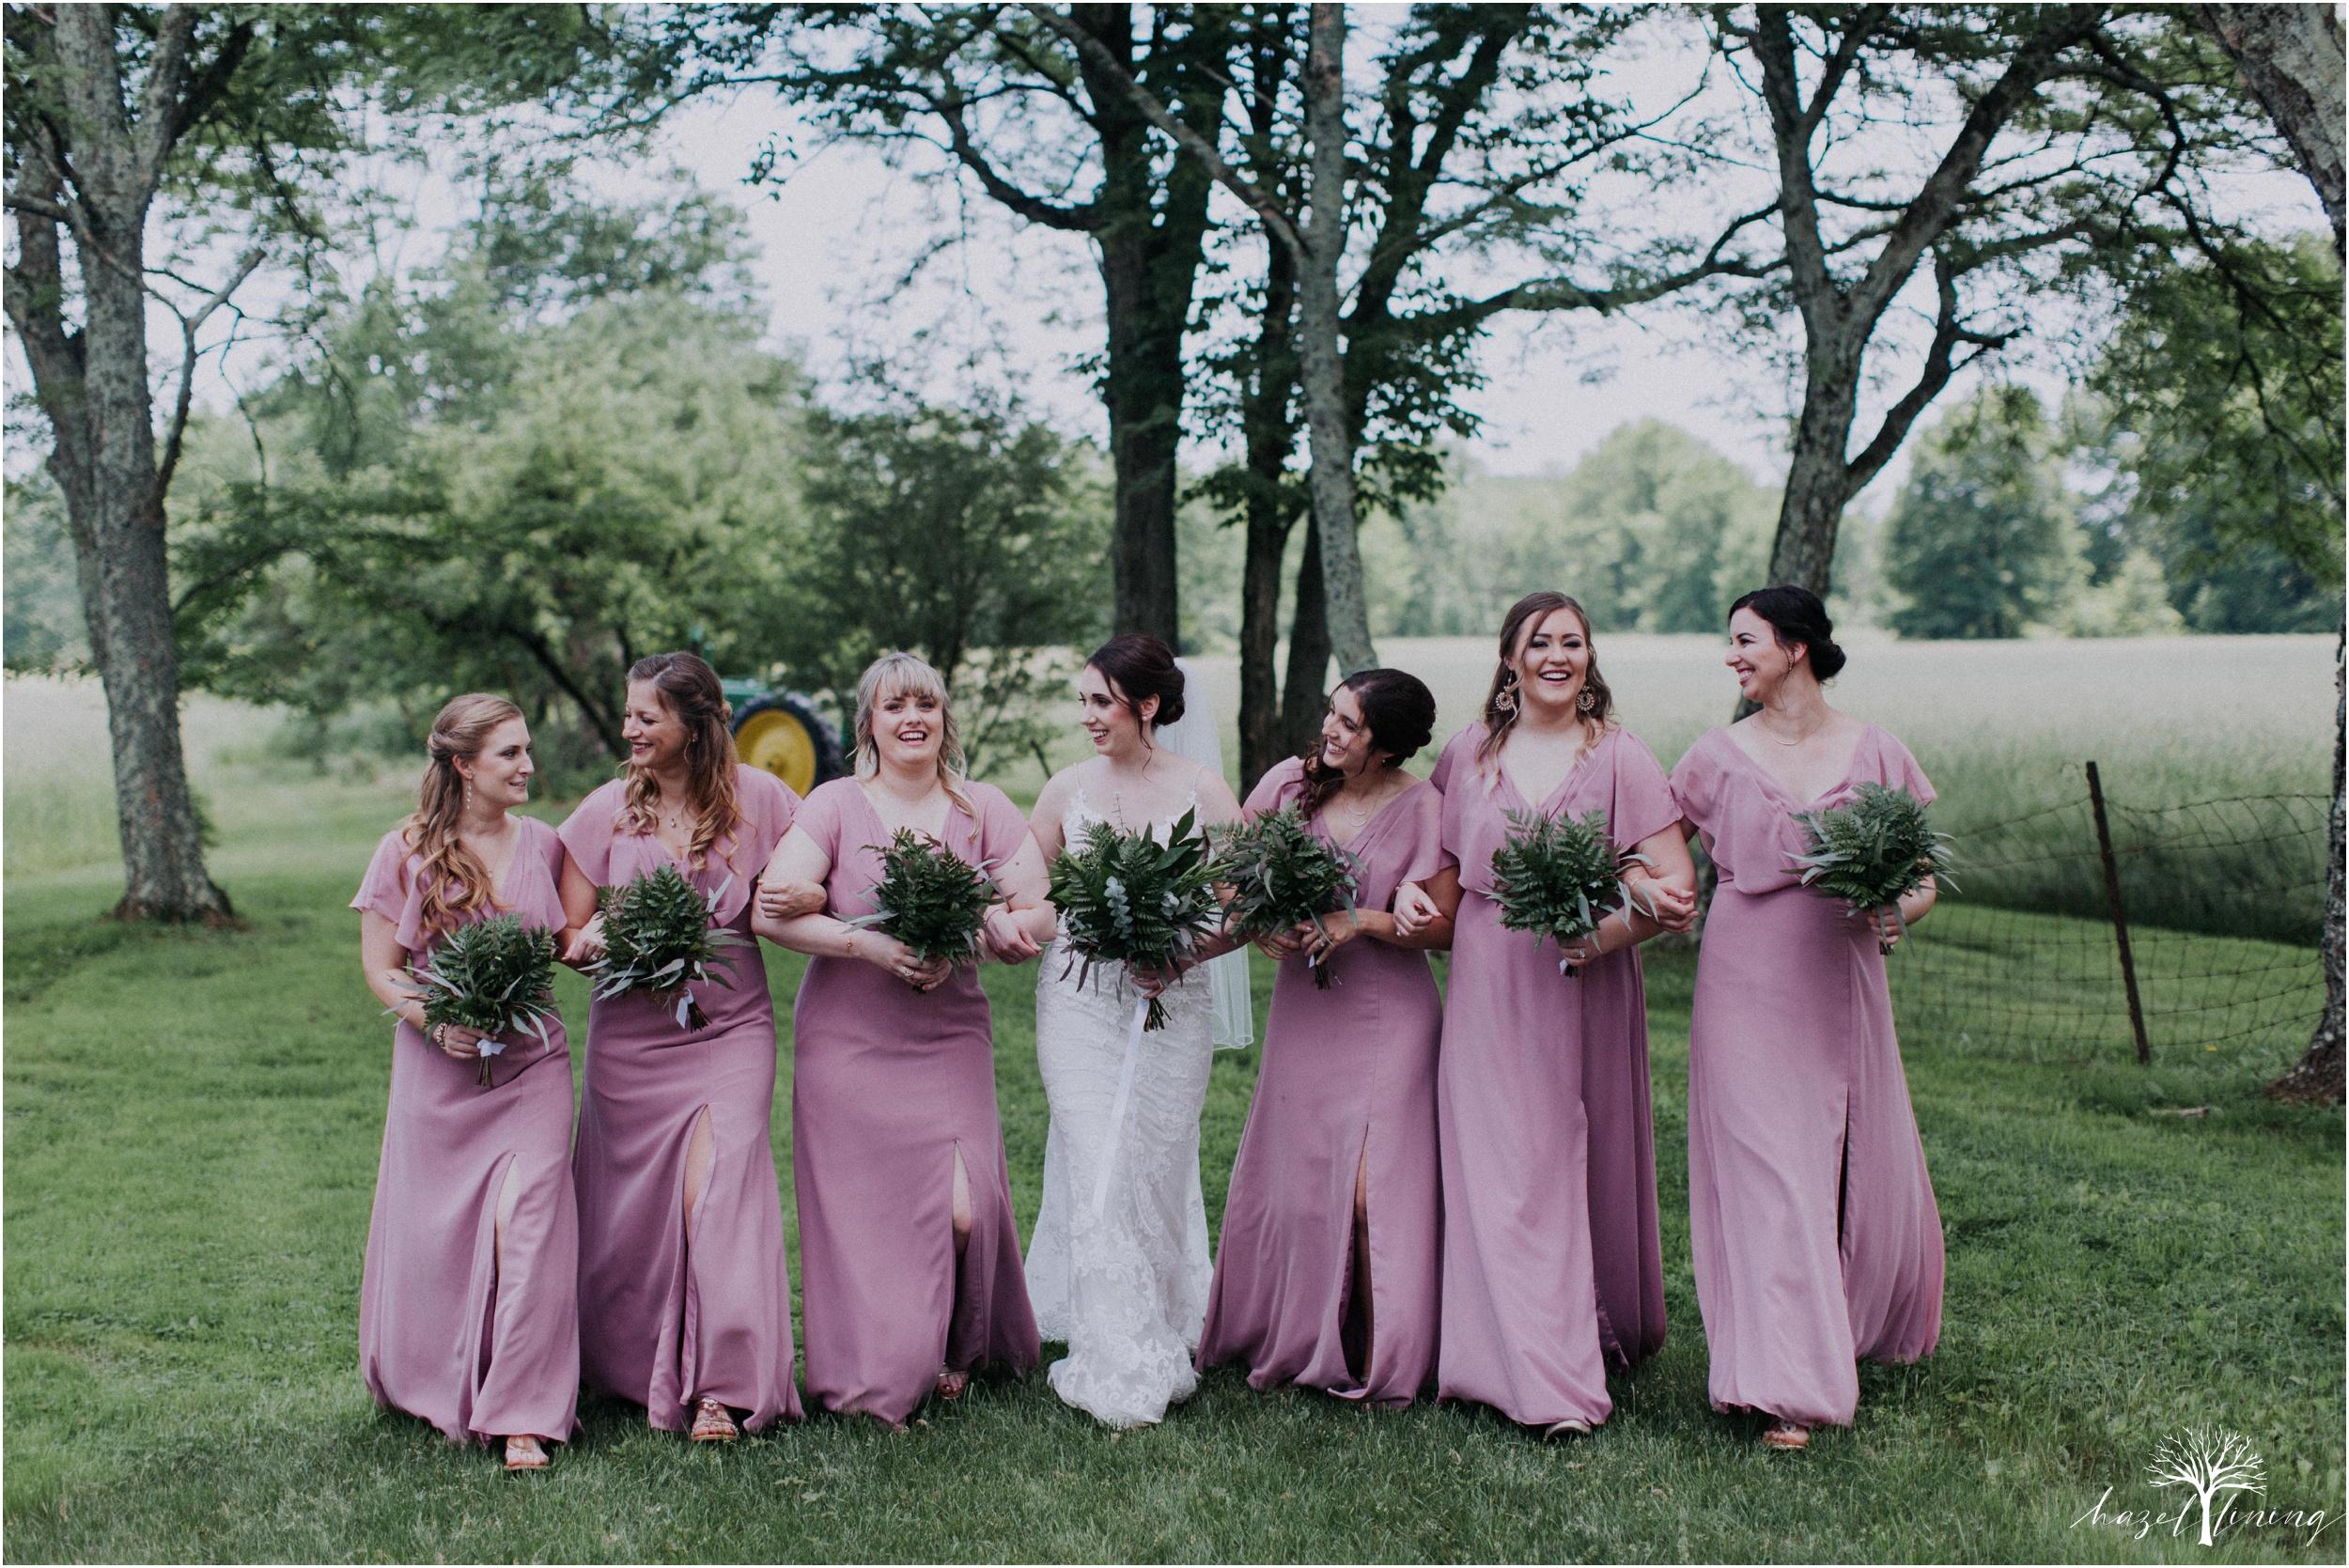 hazel-lining-travel-wedding-elopement-photography-lisa-landon-shoemaker-the-farm-bakery-and-events-bucks-county-quakertown-pennsylvania-summer-country-outdoor-farm-wedding_0032.jpg